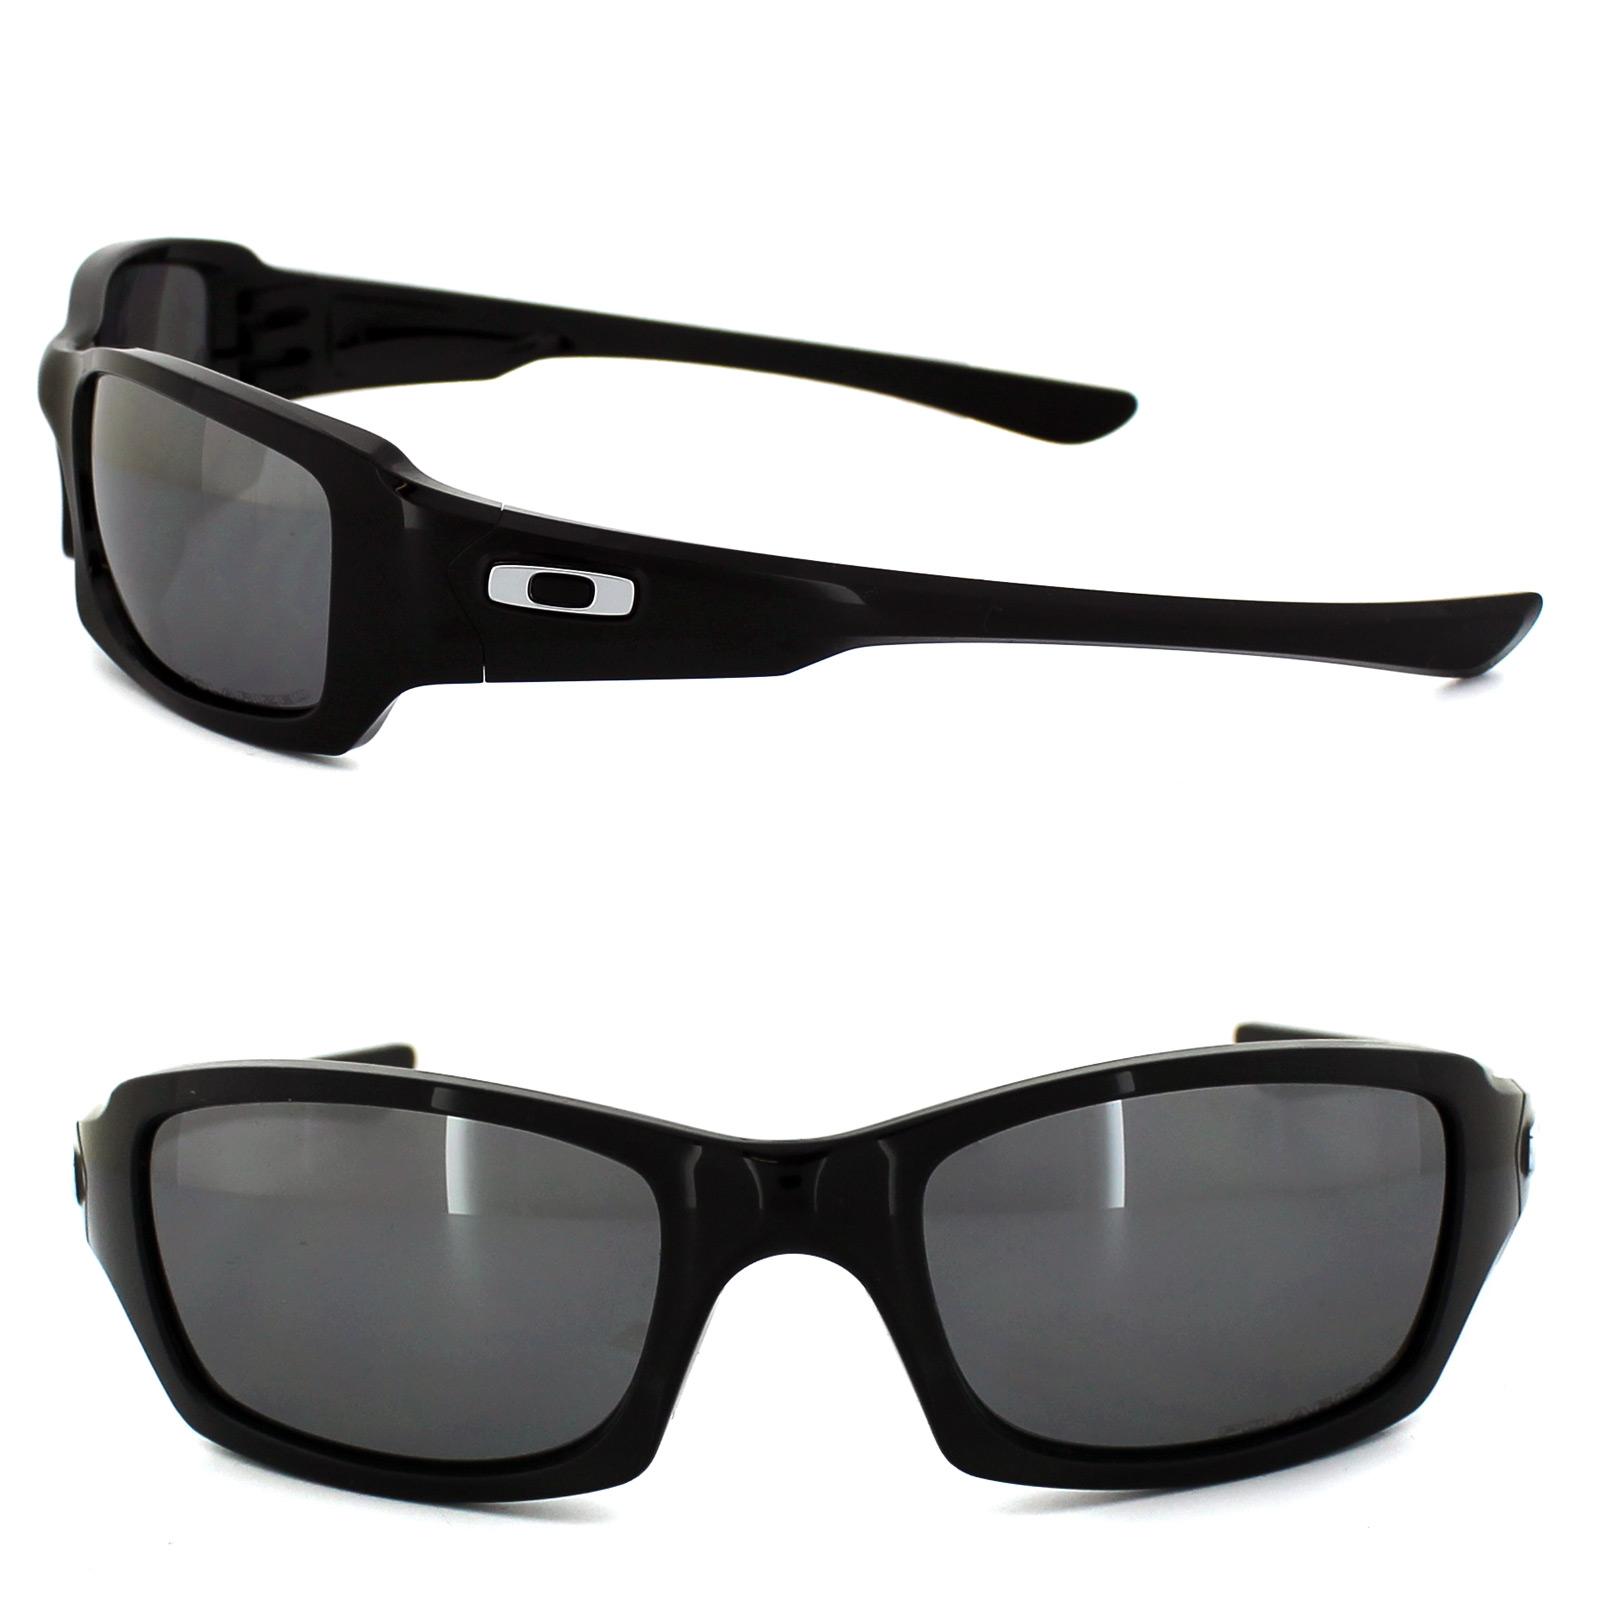 c455bffab12 Sentinel Oakley Sunglasses Fives Squared OO9238-06 Polished Black Black  Iridium Polarized. Sentinel Thumbnail 3